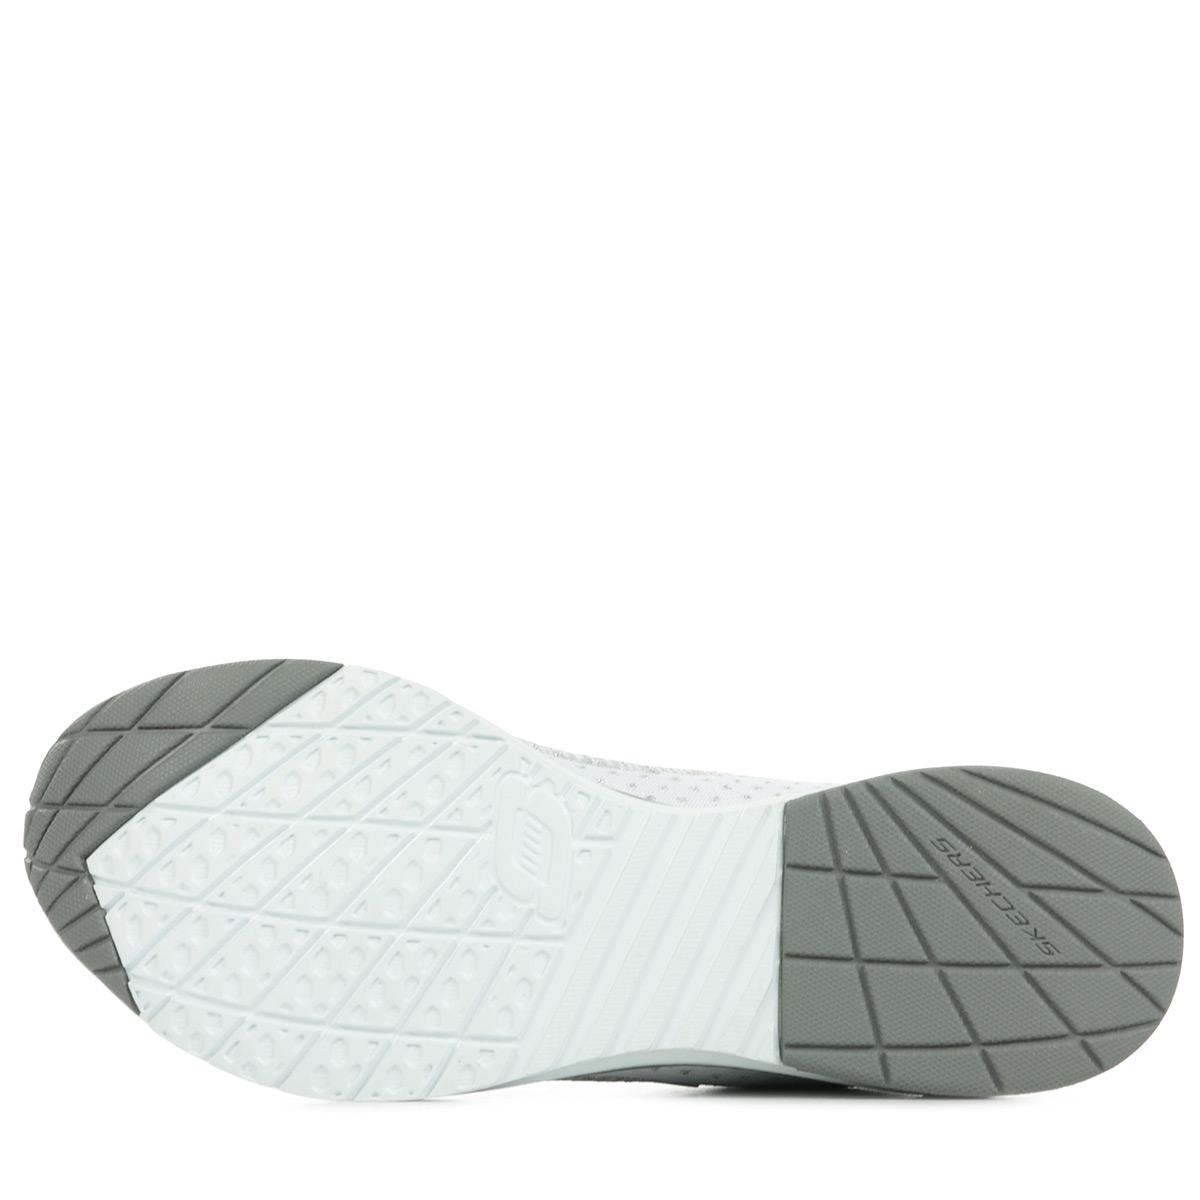 Skechers Skech-air infinity 12114WSL, Baskets mode femme